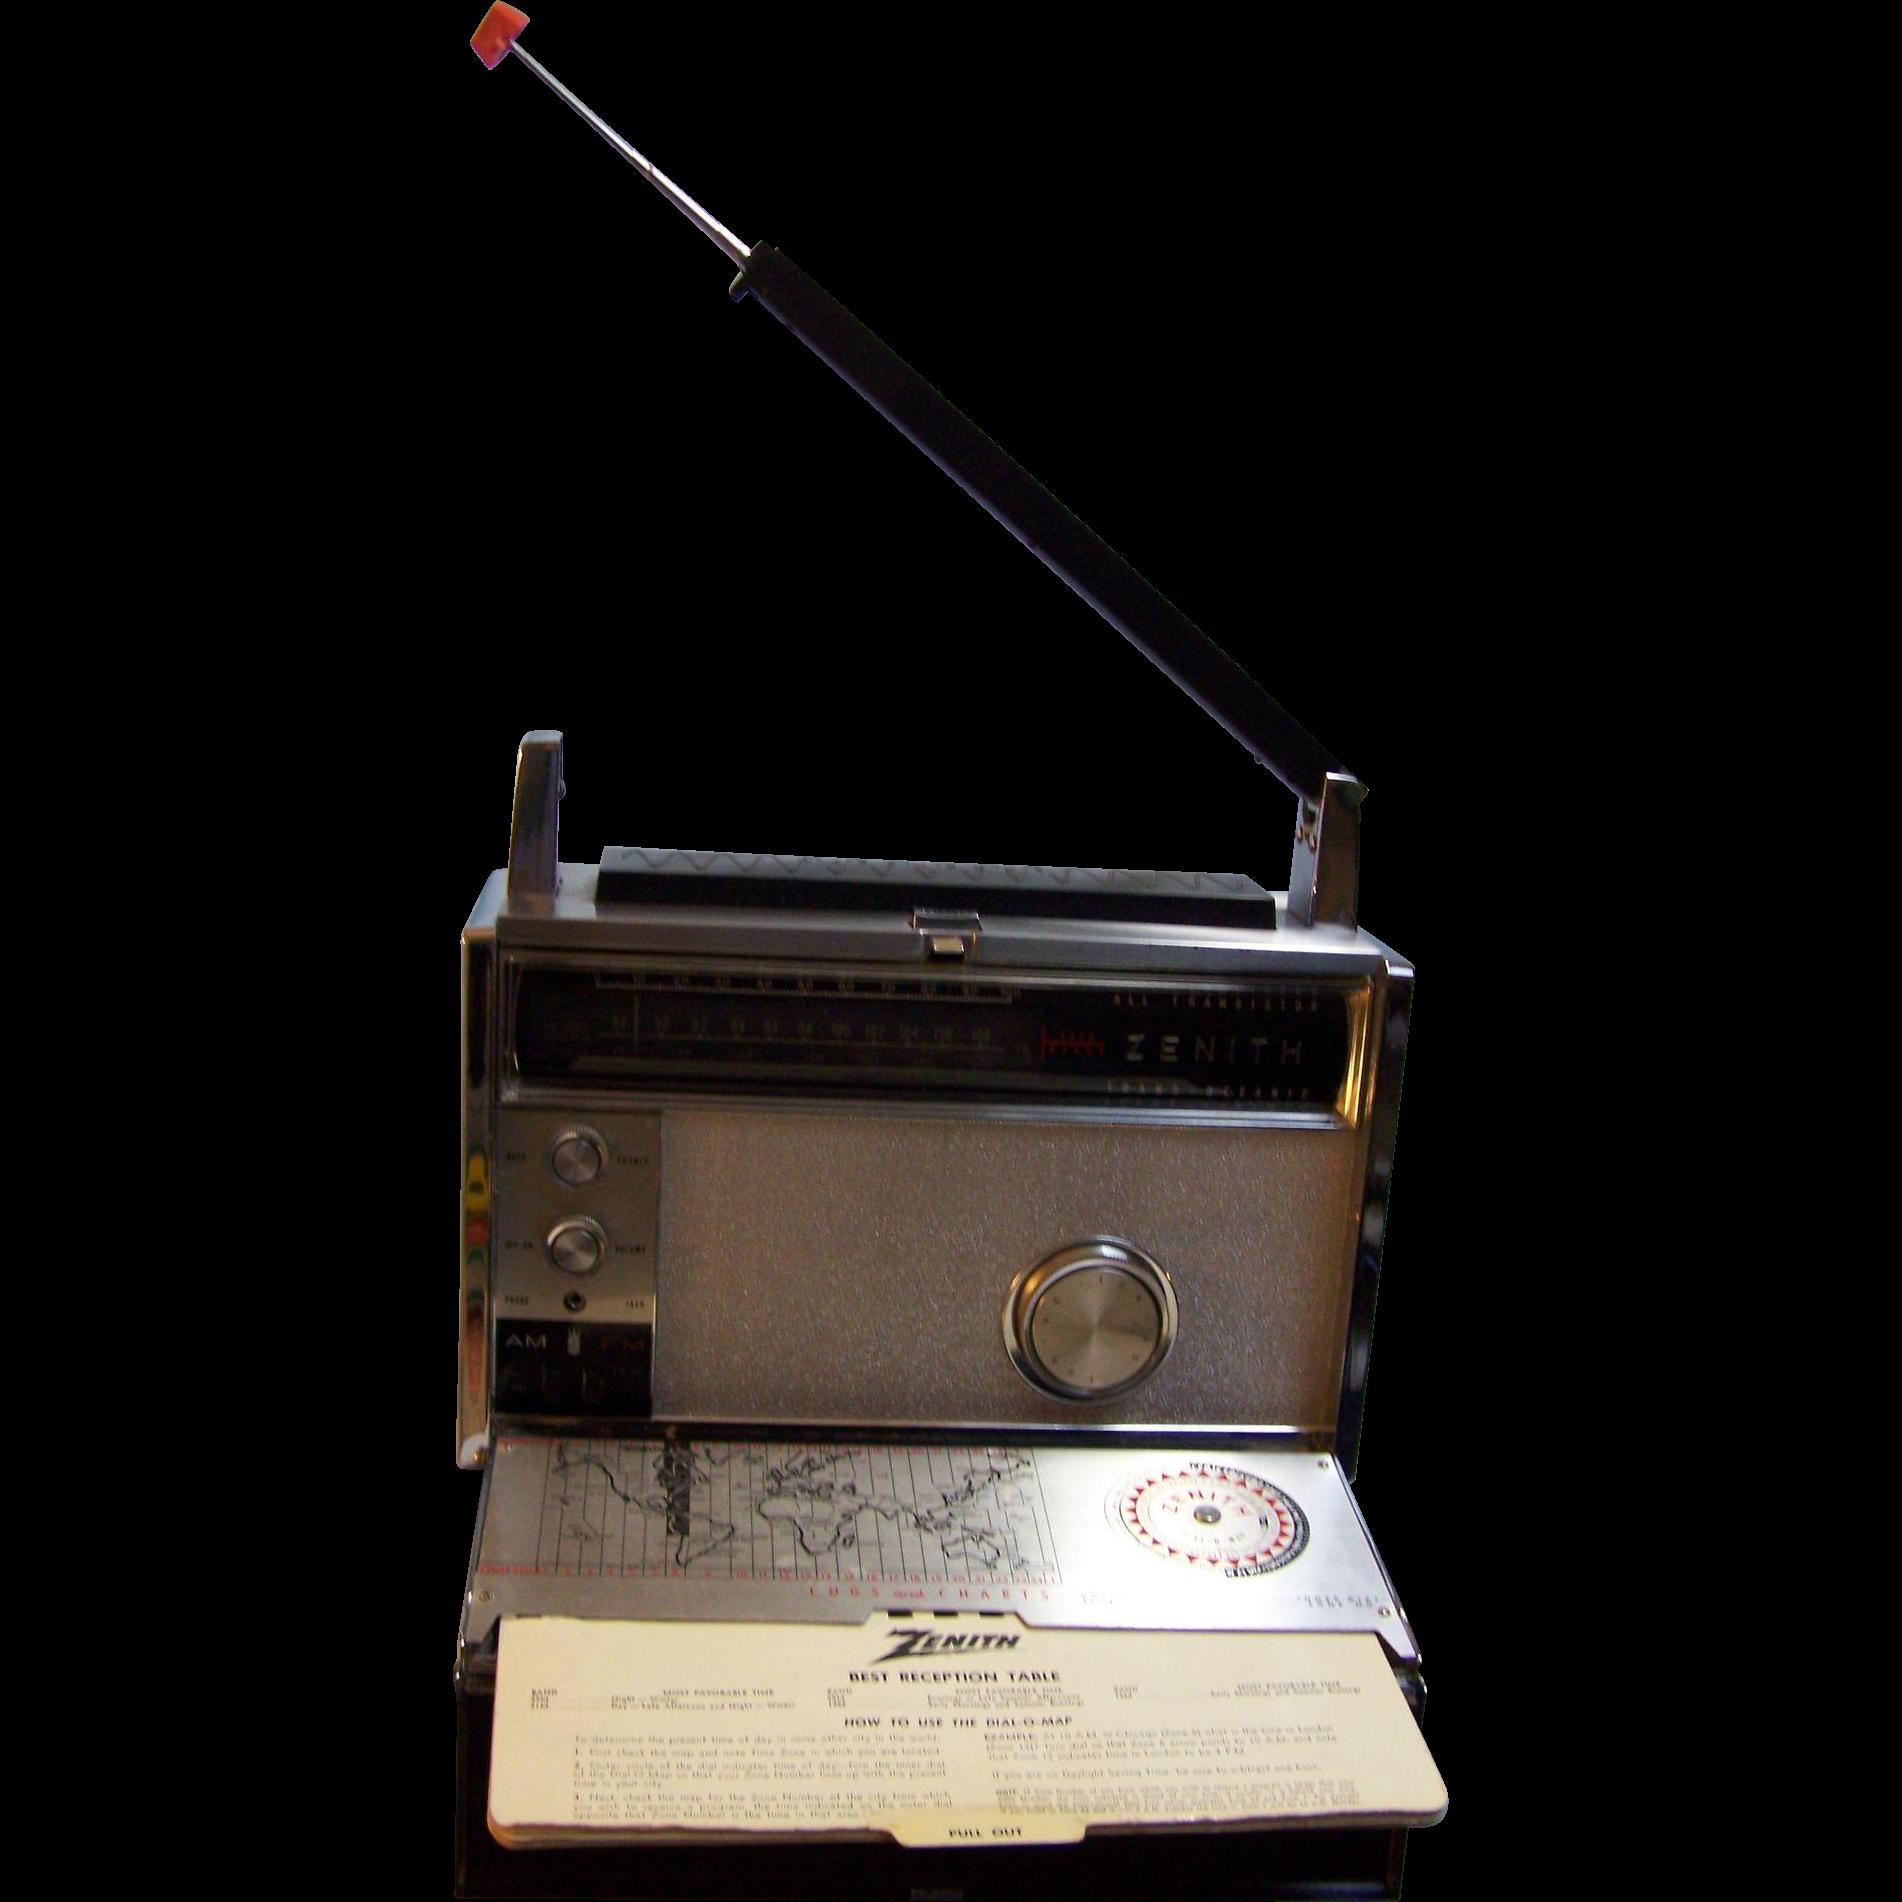 Zenith Trans Oceanic 3000-1 Multi Band AM FM Radio